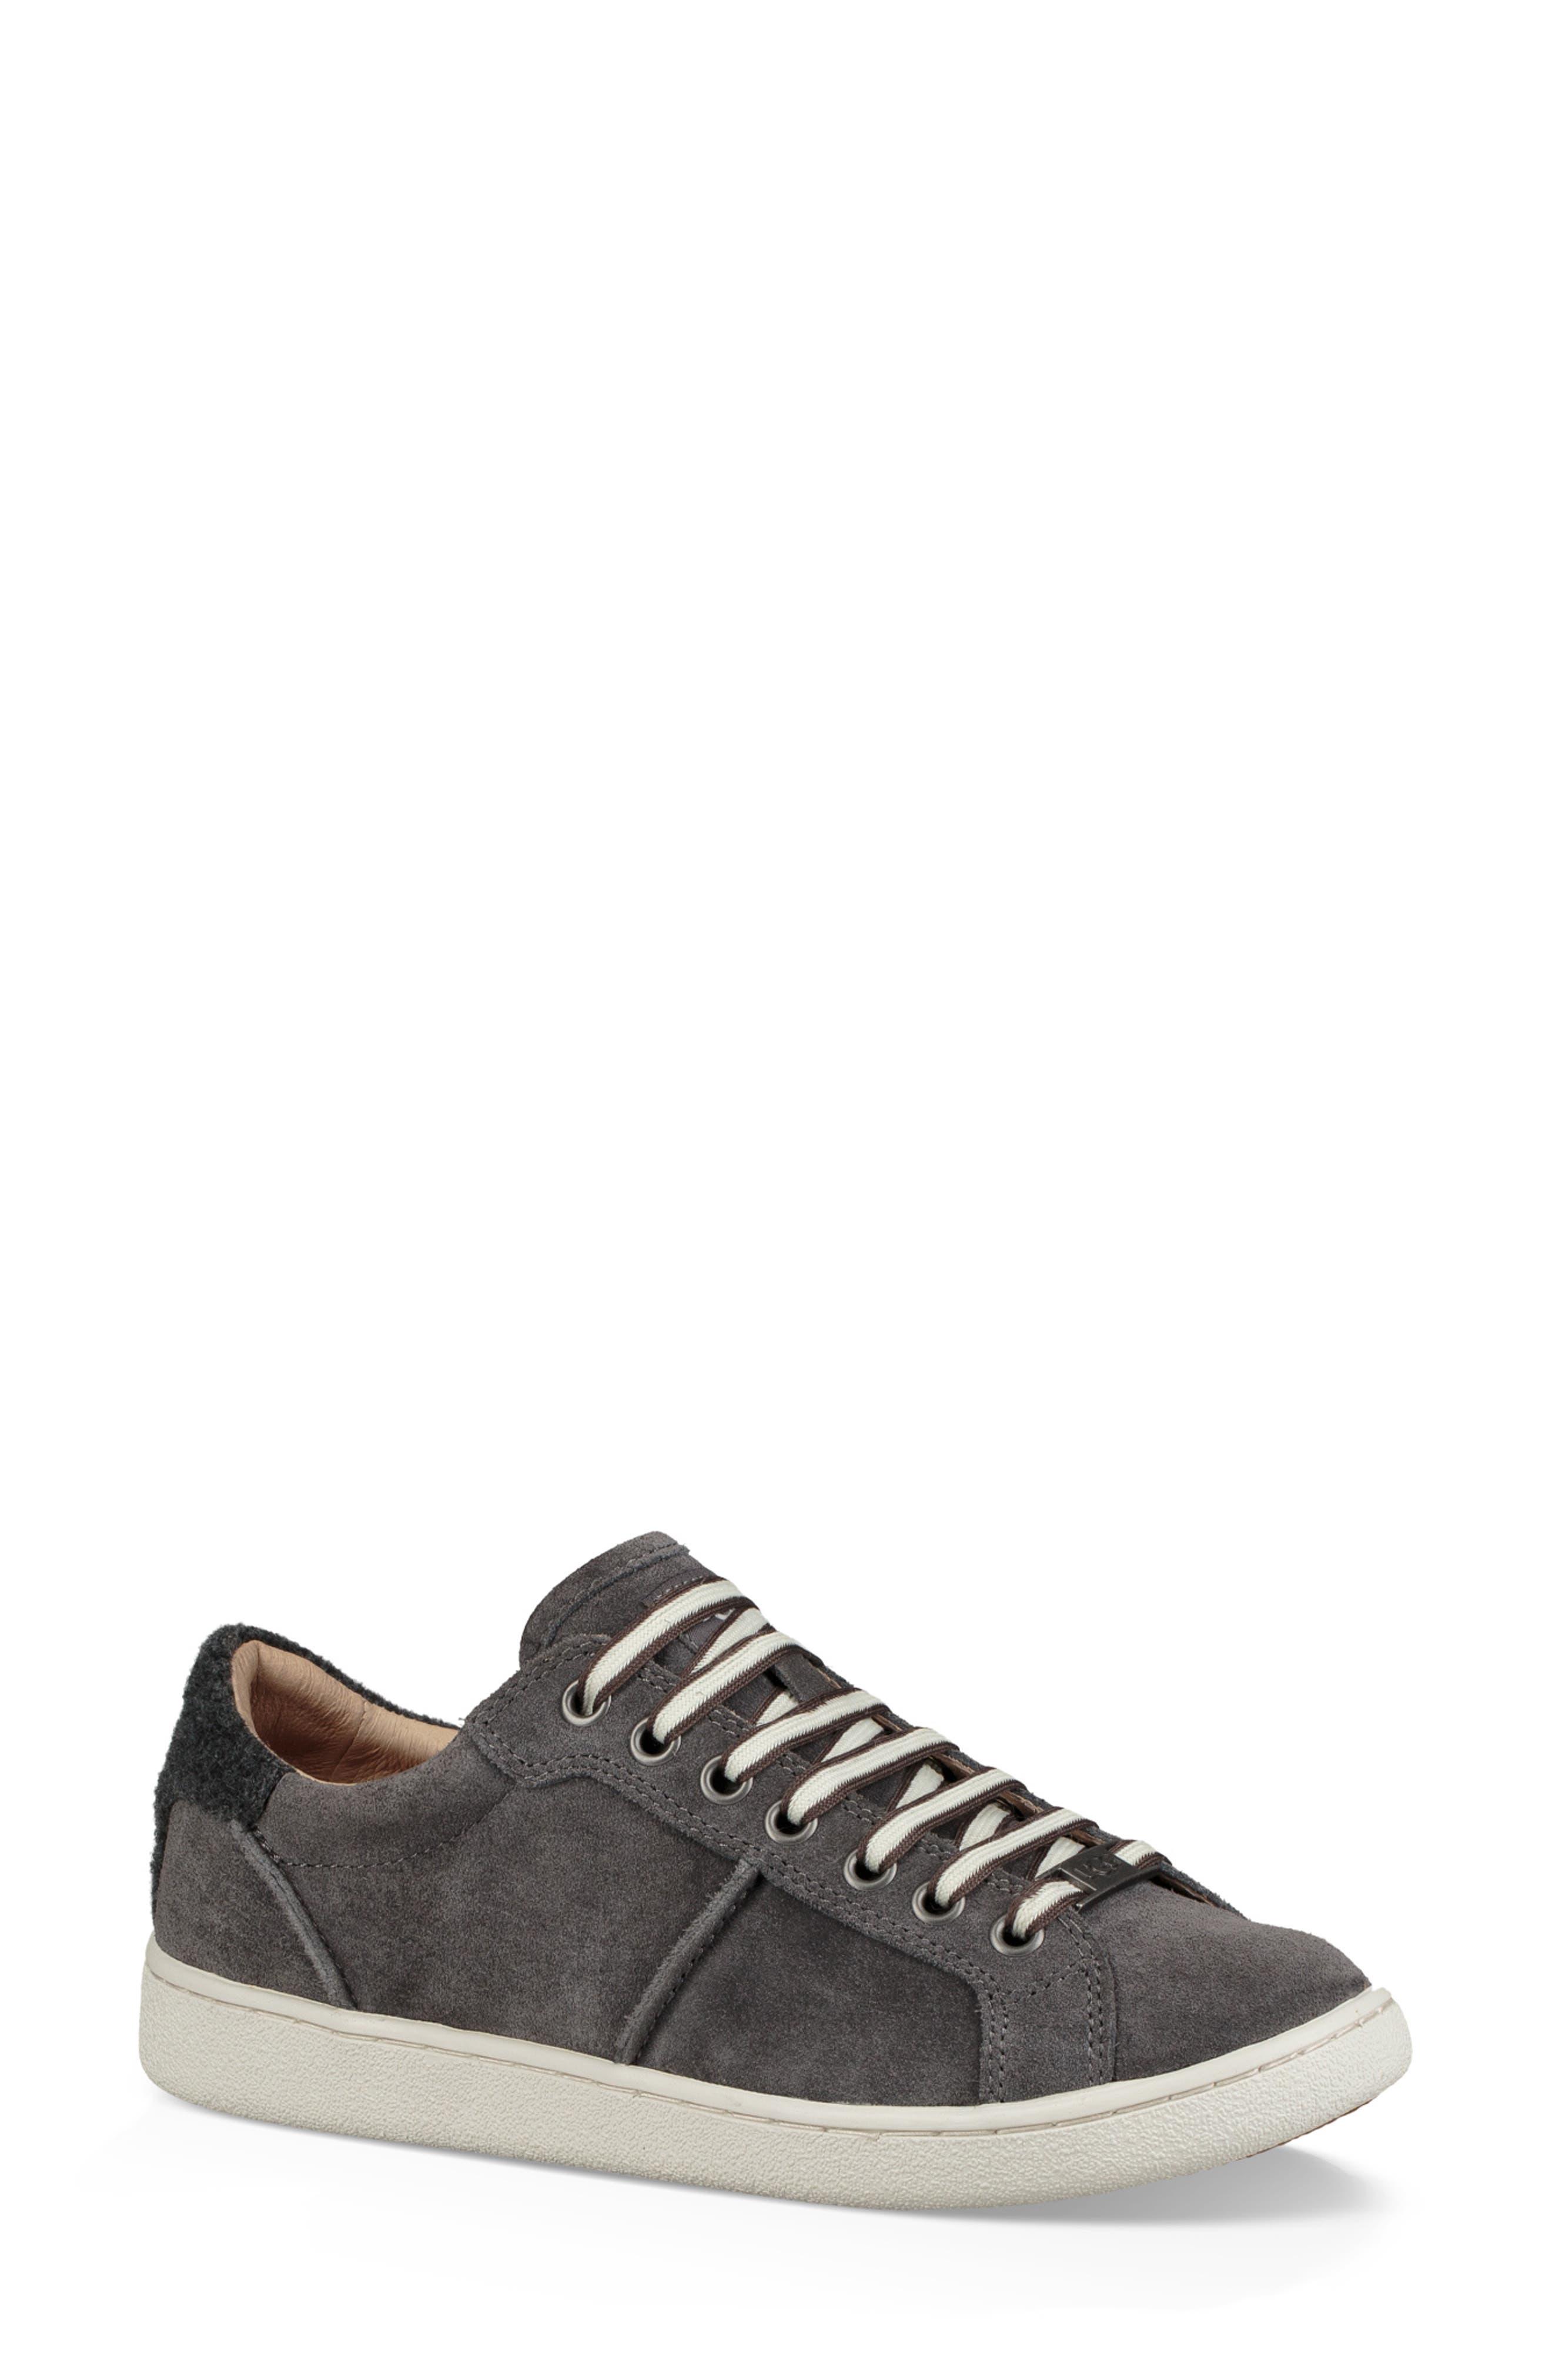 Milo Sneaker,                             Main thumbnail 1, color,                             CHARCOAL SUEDE